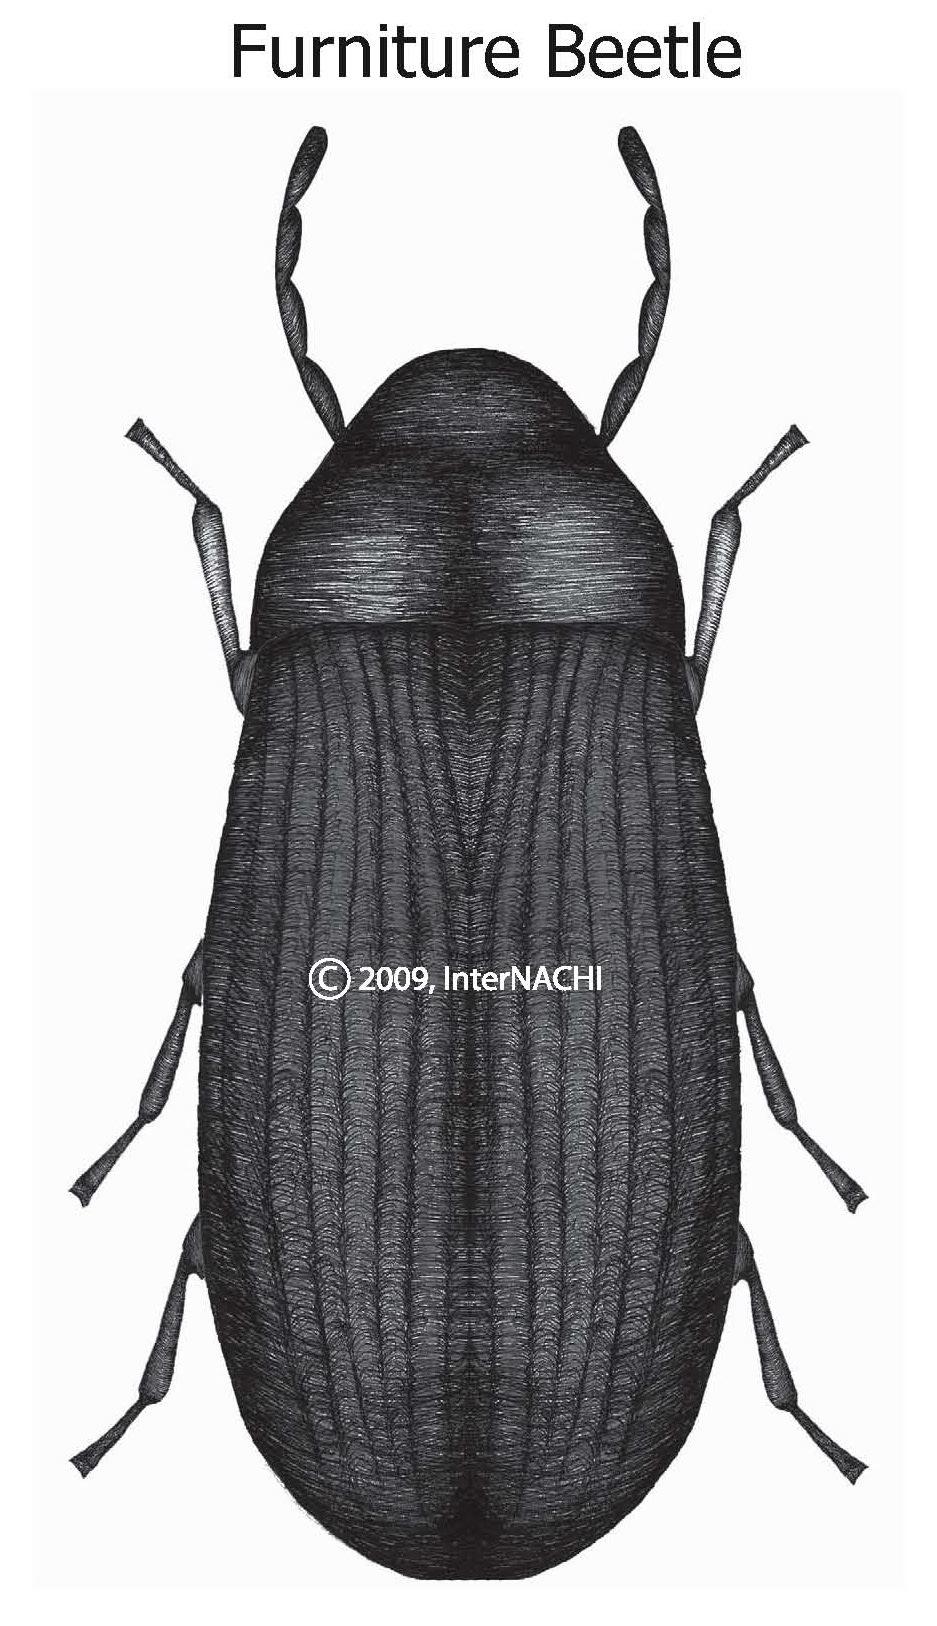 Furniture beetle.